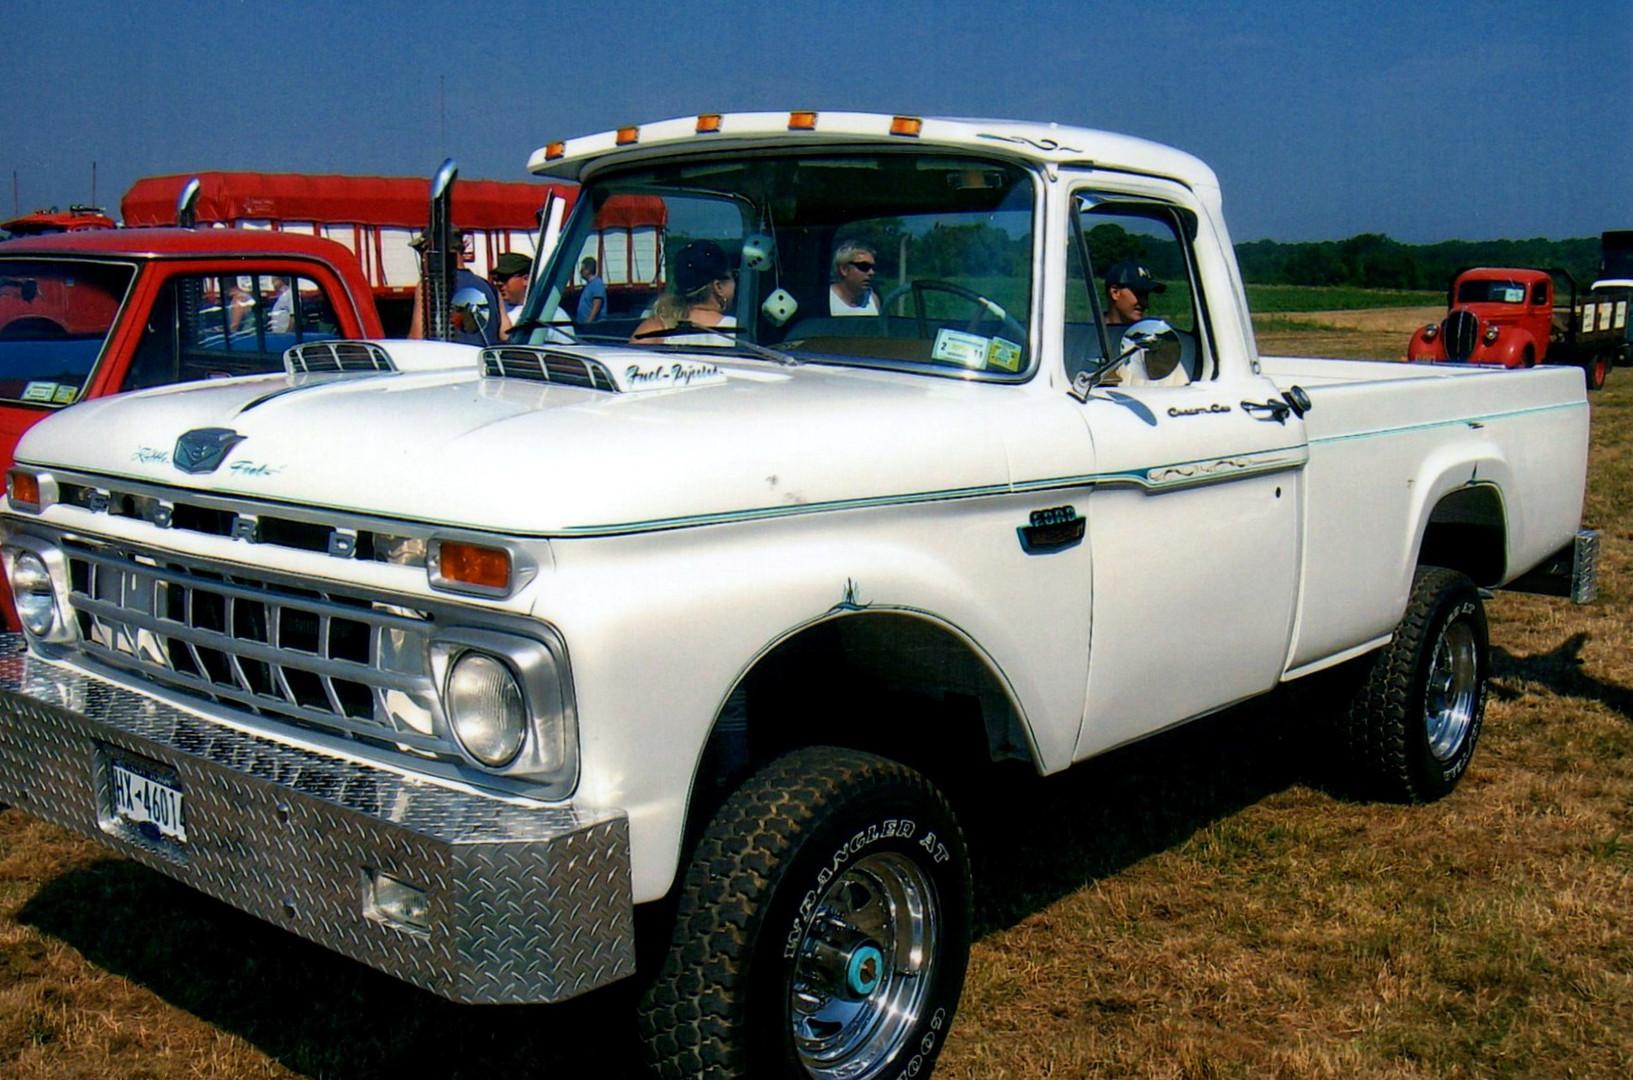 1965 Ford F250 pickup - Christopher Ketcham